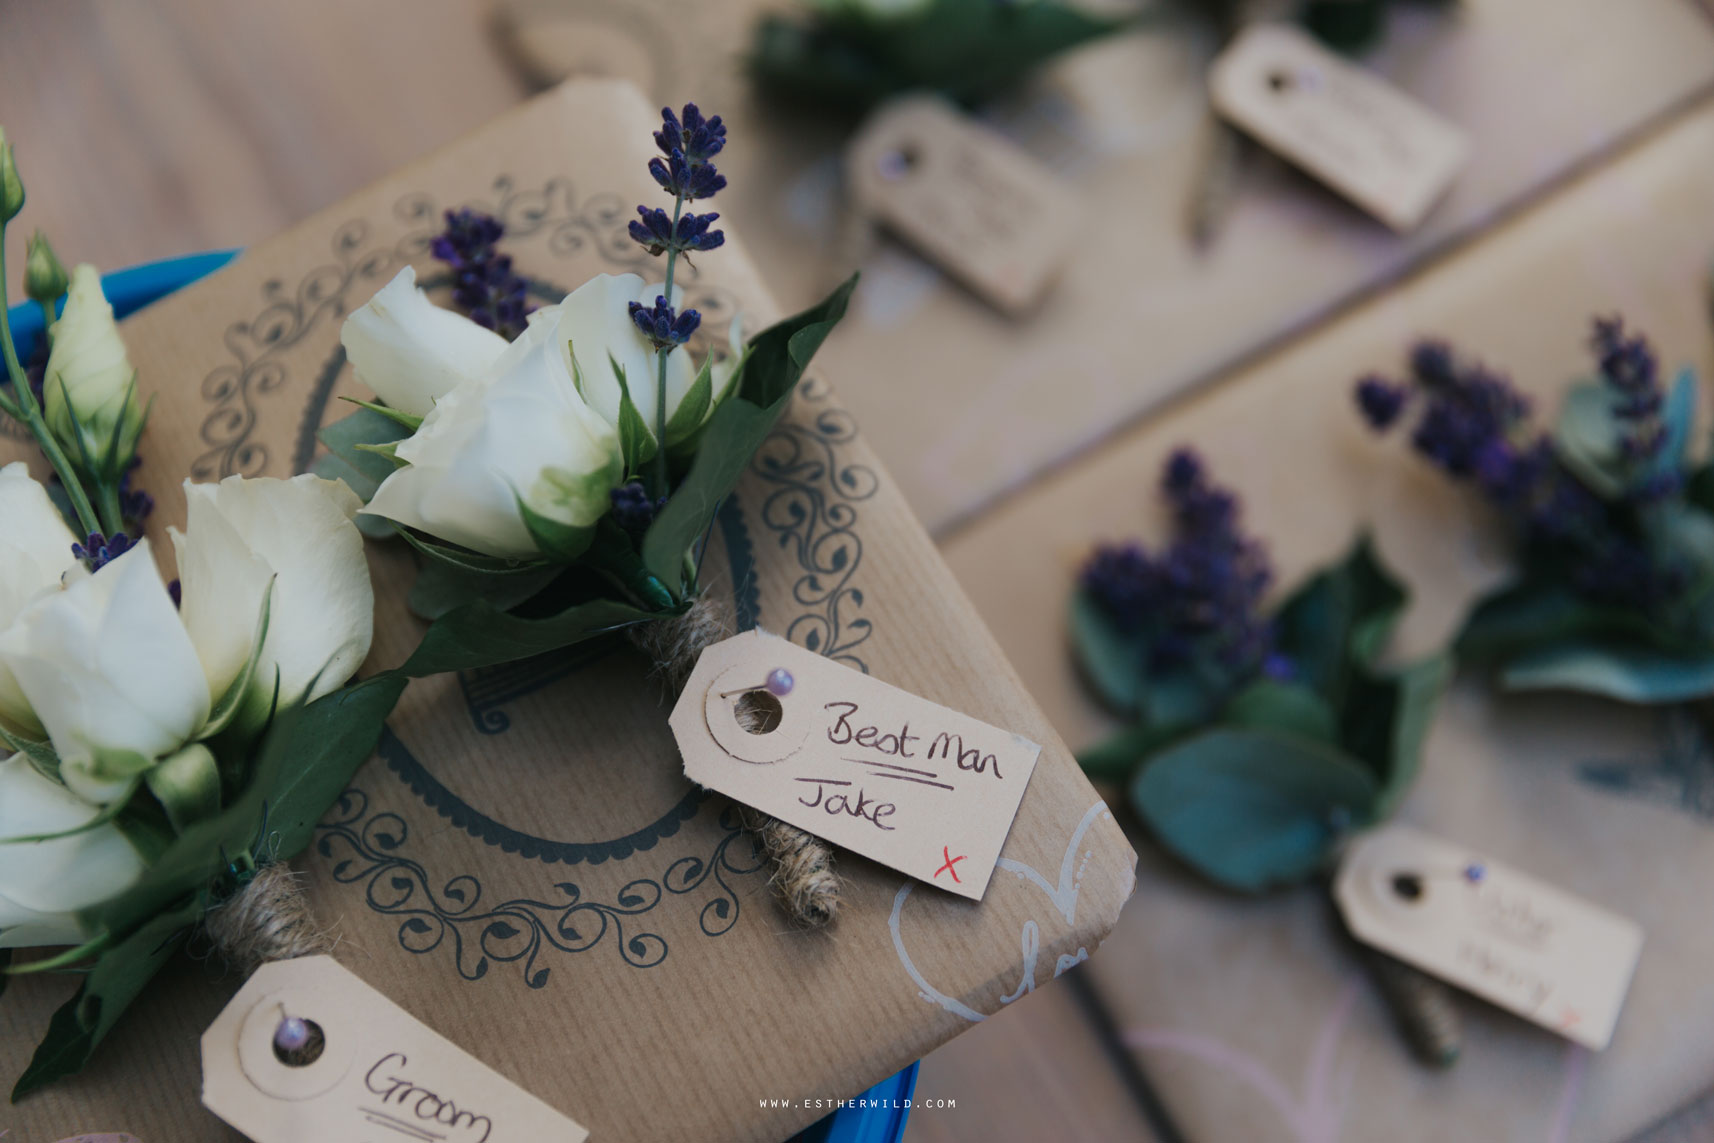 Cromer_Wedding_Beach_Outdoor_Ceremony_Norfolk_North_Lodge_Registry_Office_Rocket_House_Cafe_Cromer_Pier_IMG_3213_IMGL7460.jpg